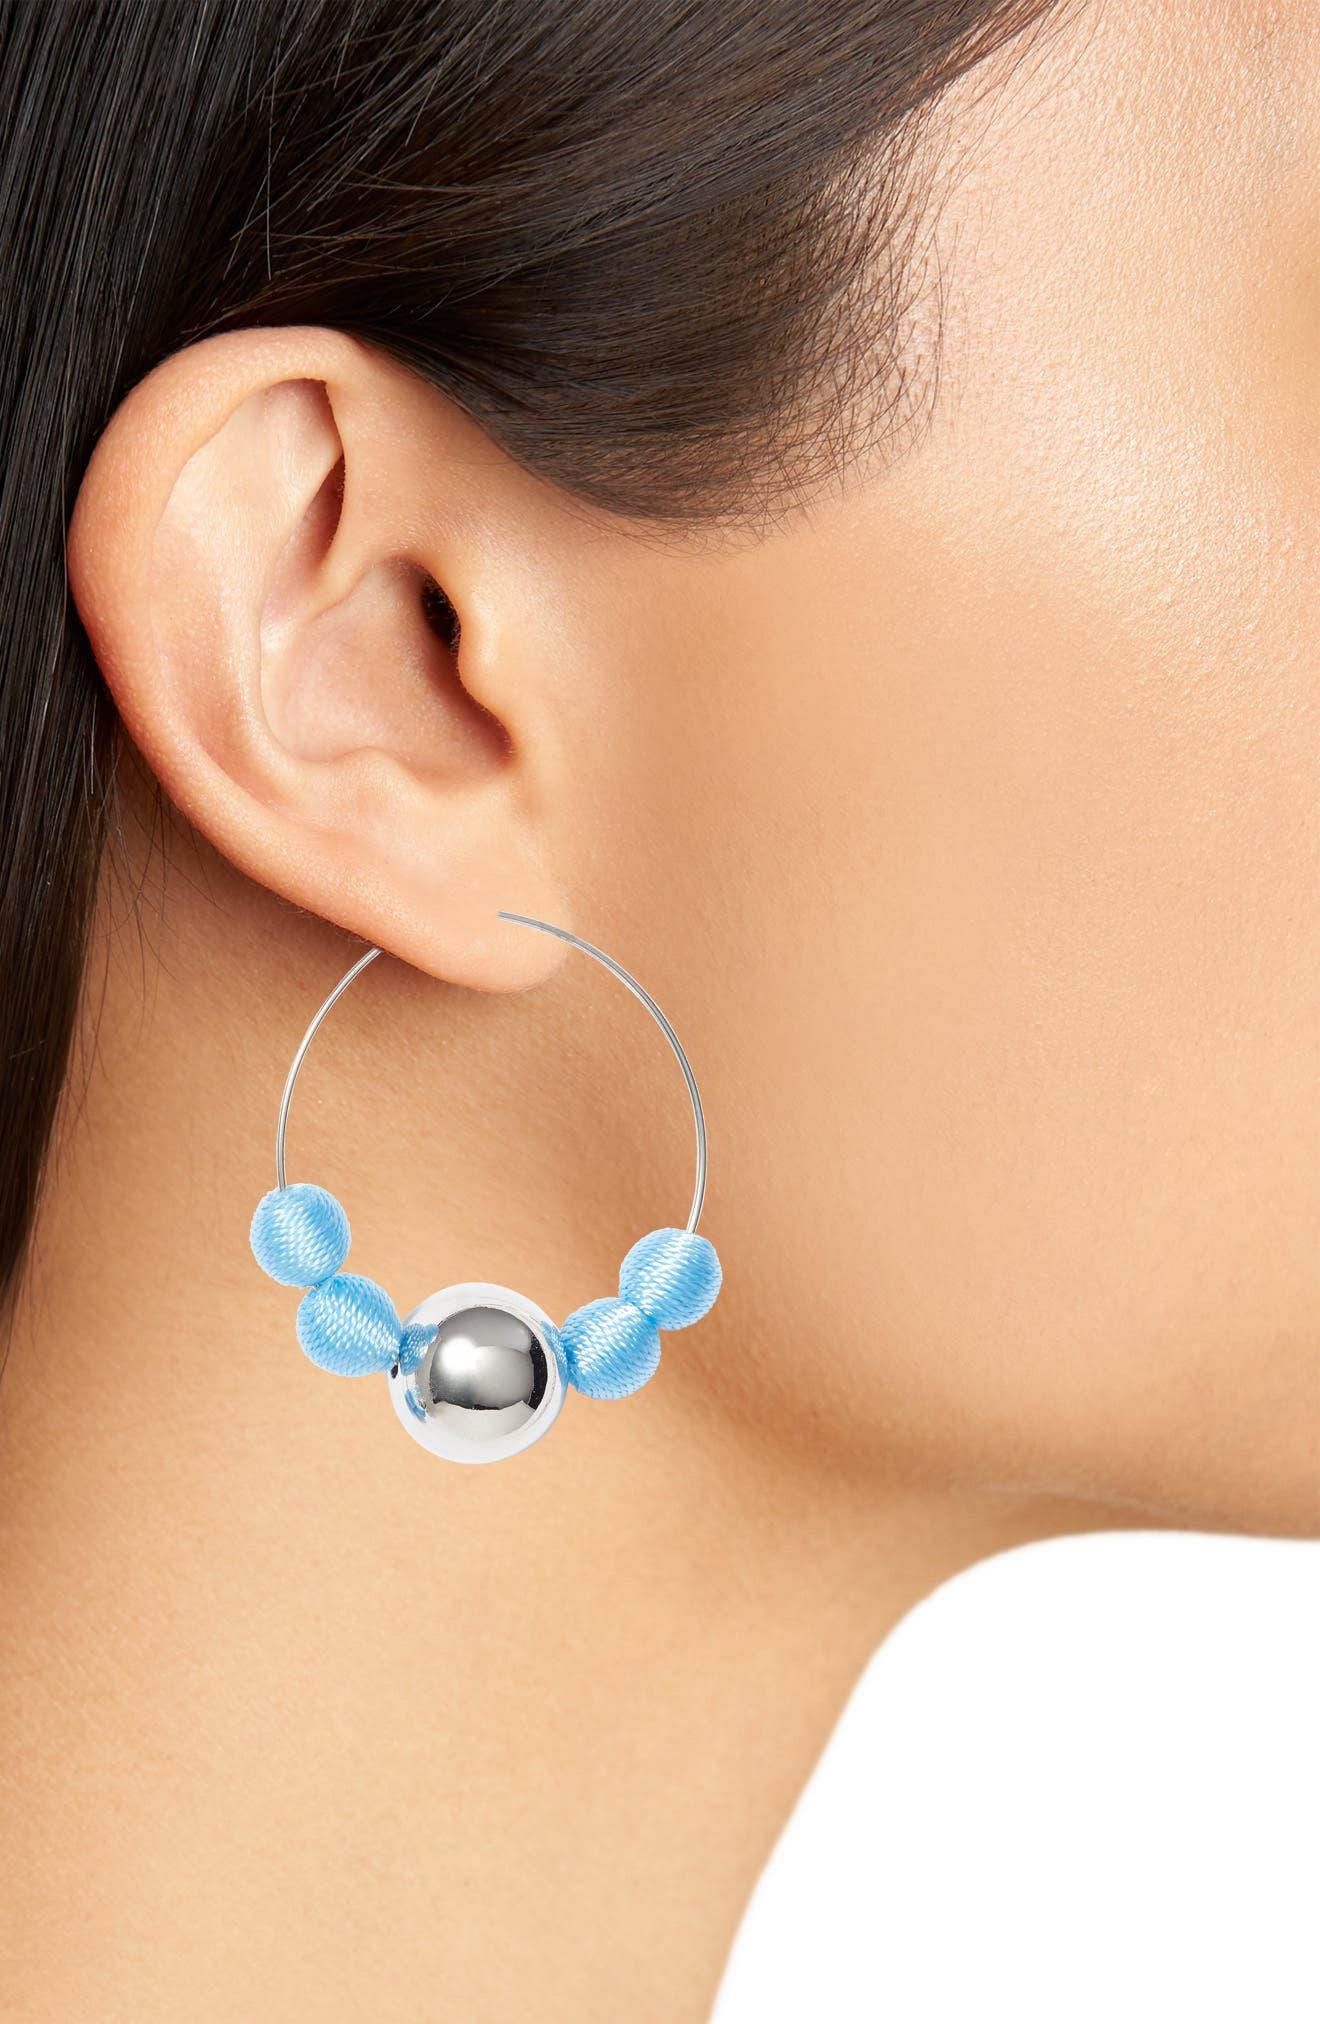 Threaded Sphere Hoop Earrings,                             Alternate thumbnail 2, color,                             Blue/ Silver